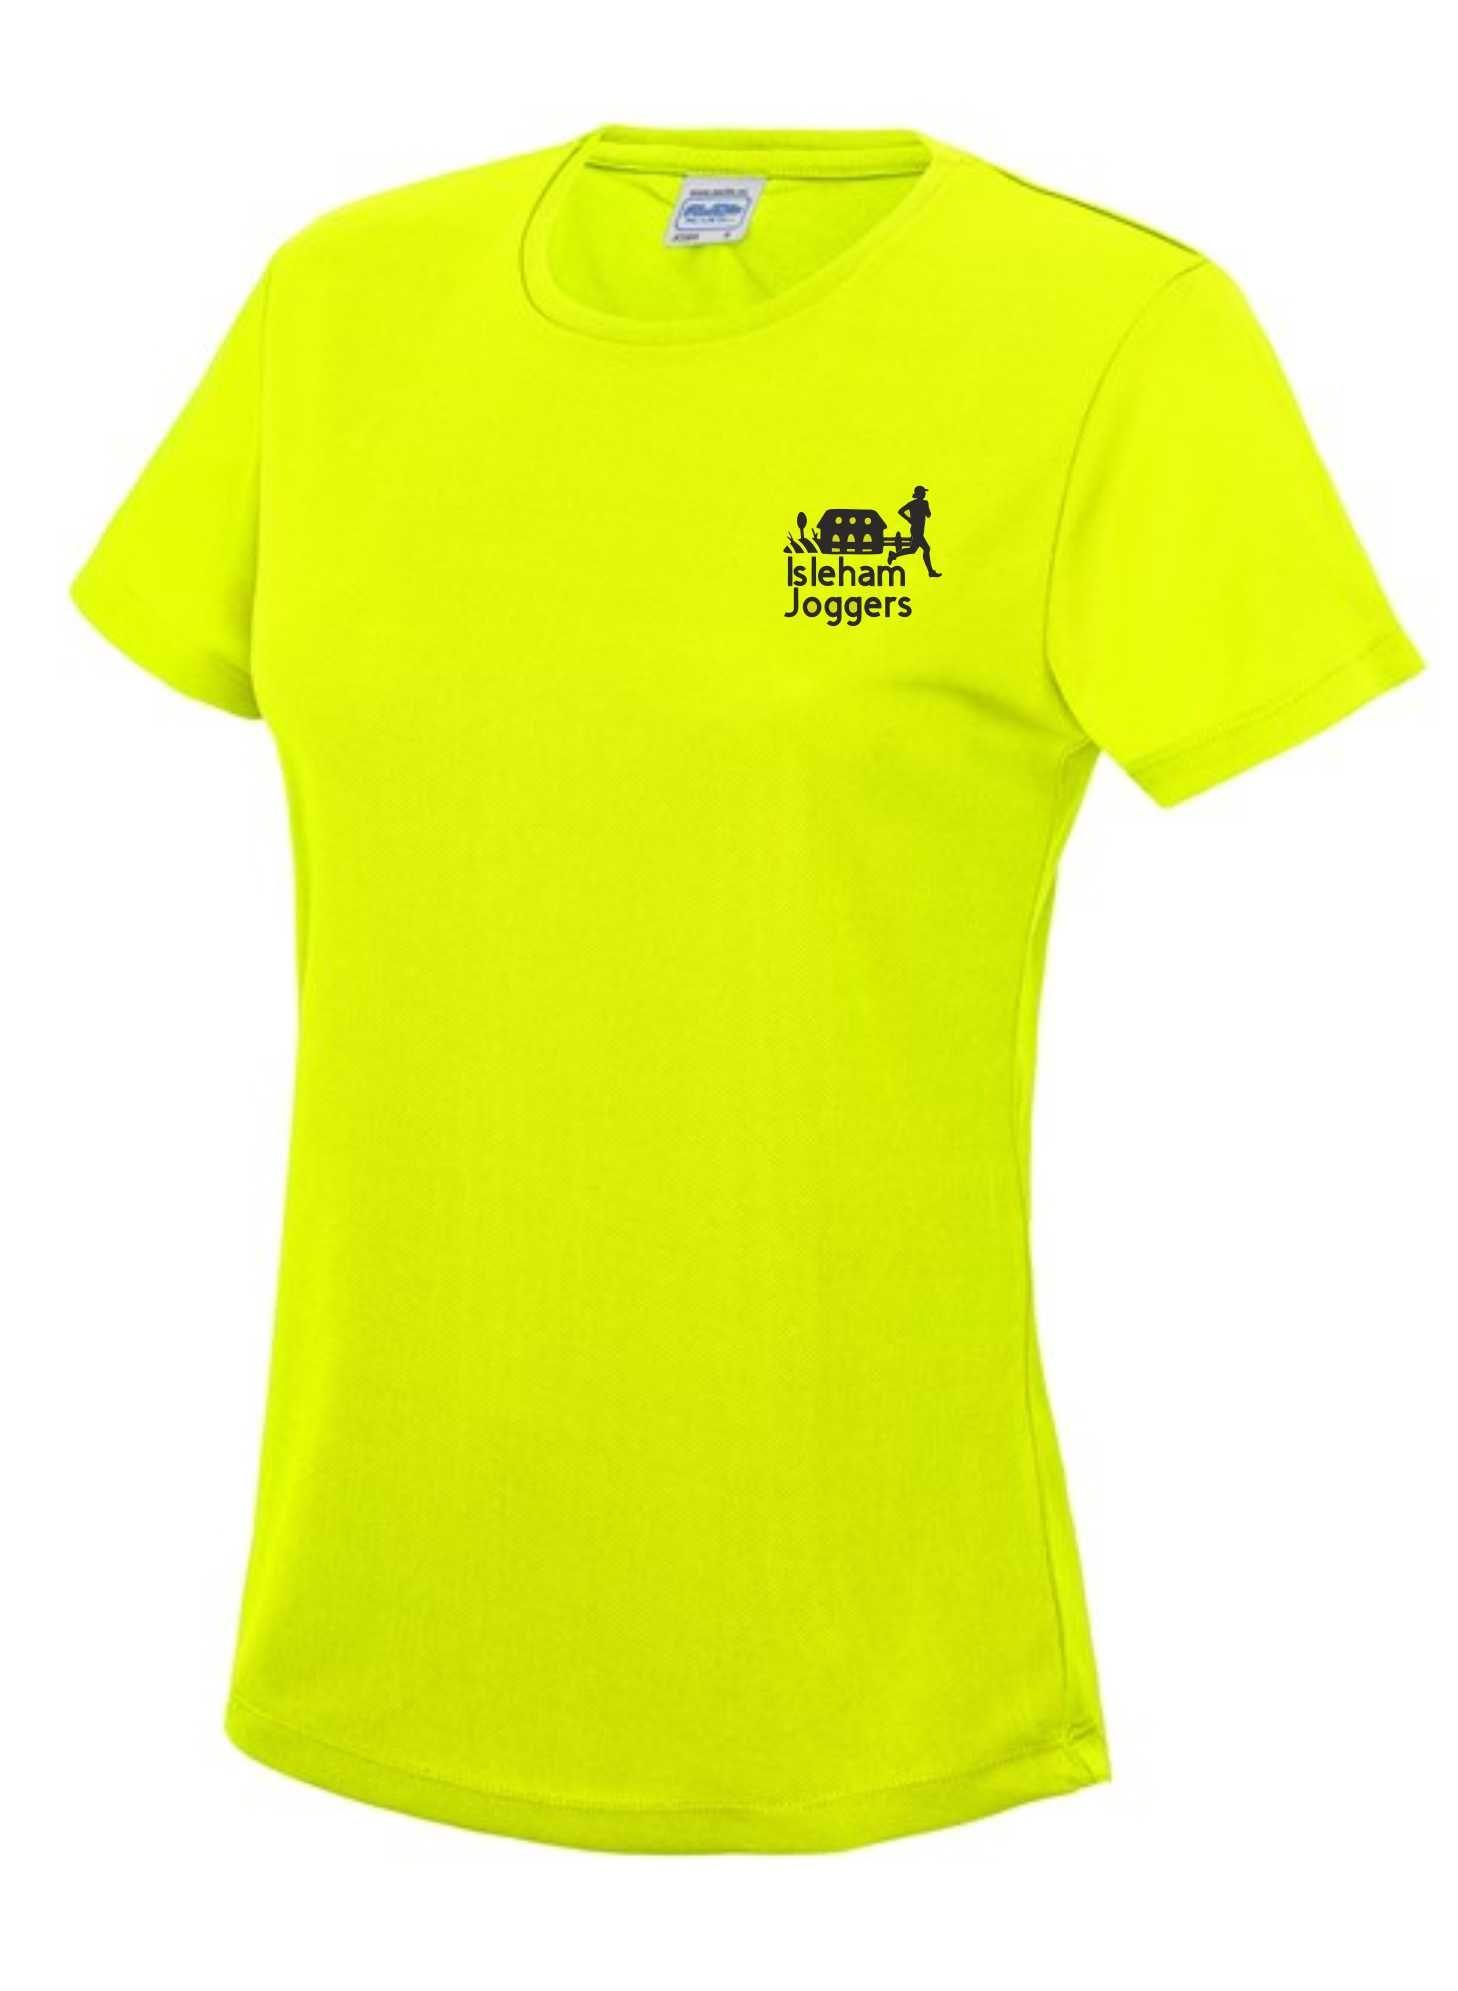 Isleham Joggers- Ladies T-Shirt